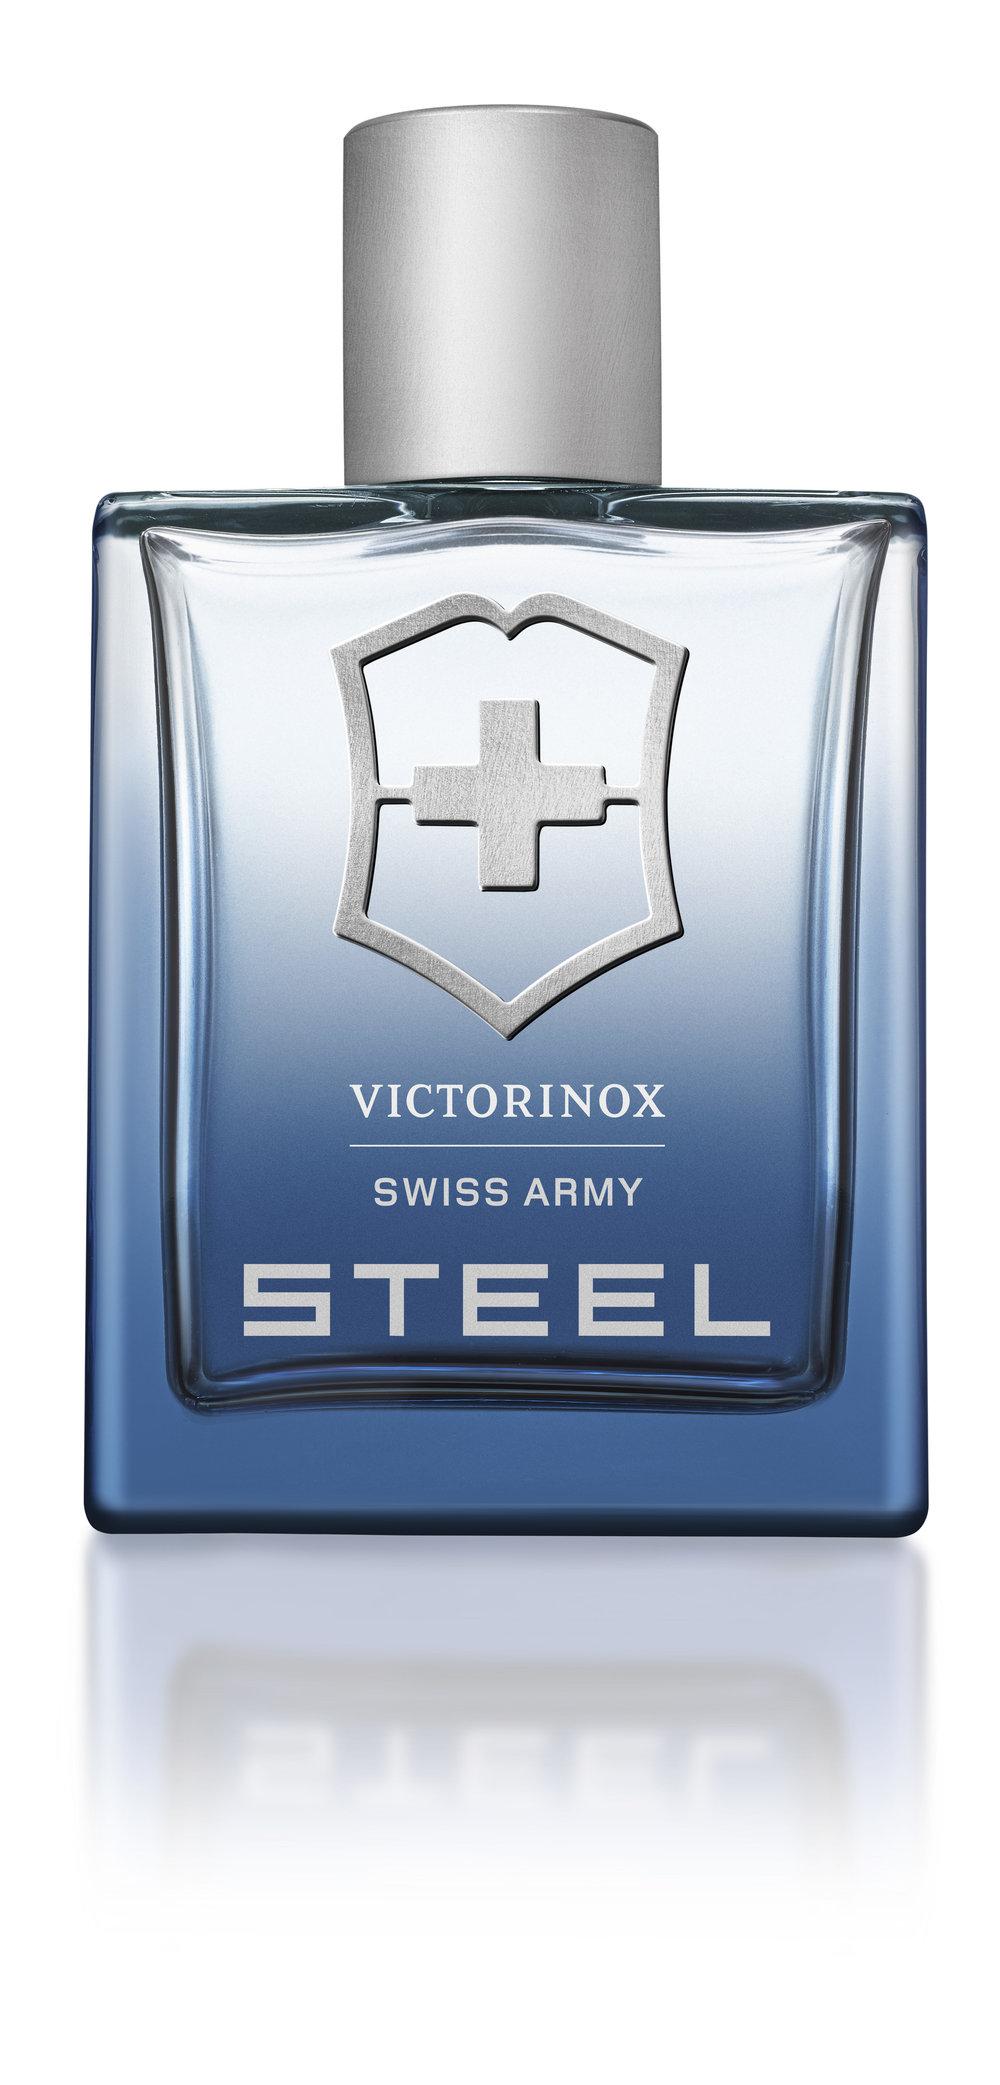 Victorinox Steel.jpg